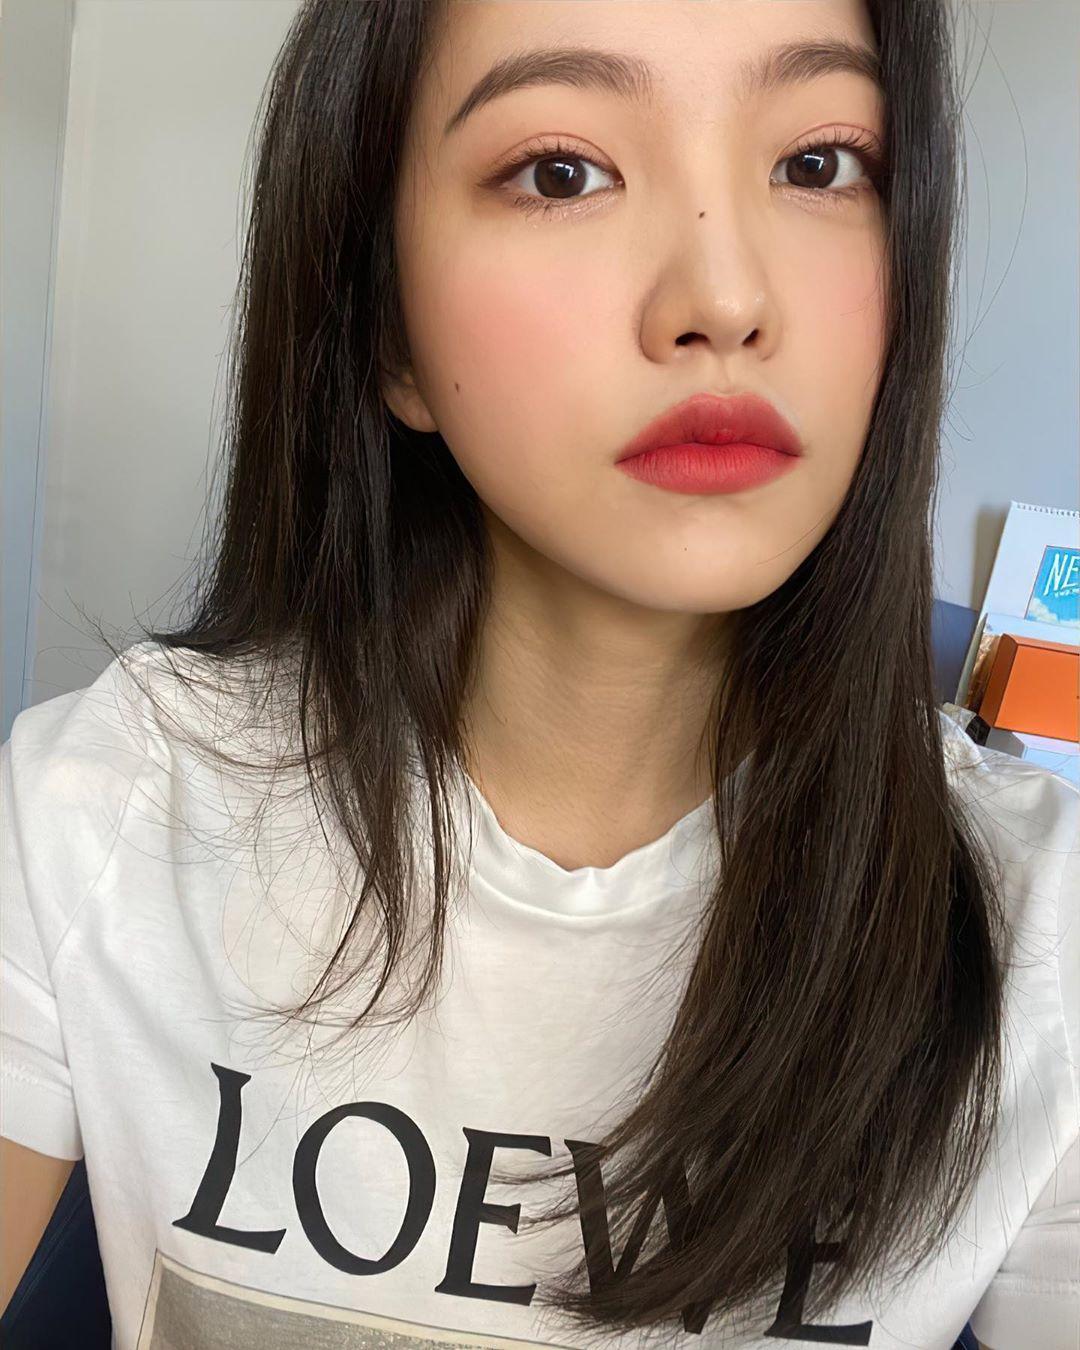 Yeri South Korean Singer, Song Writer